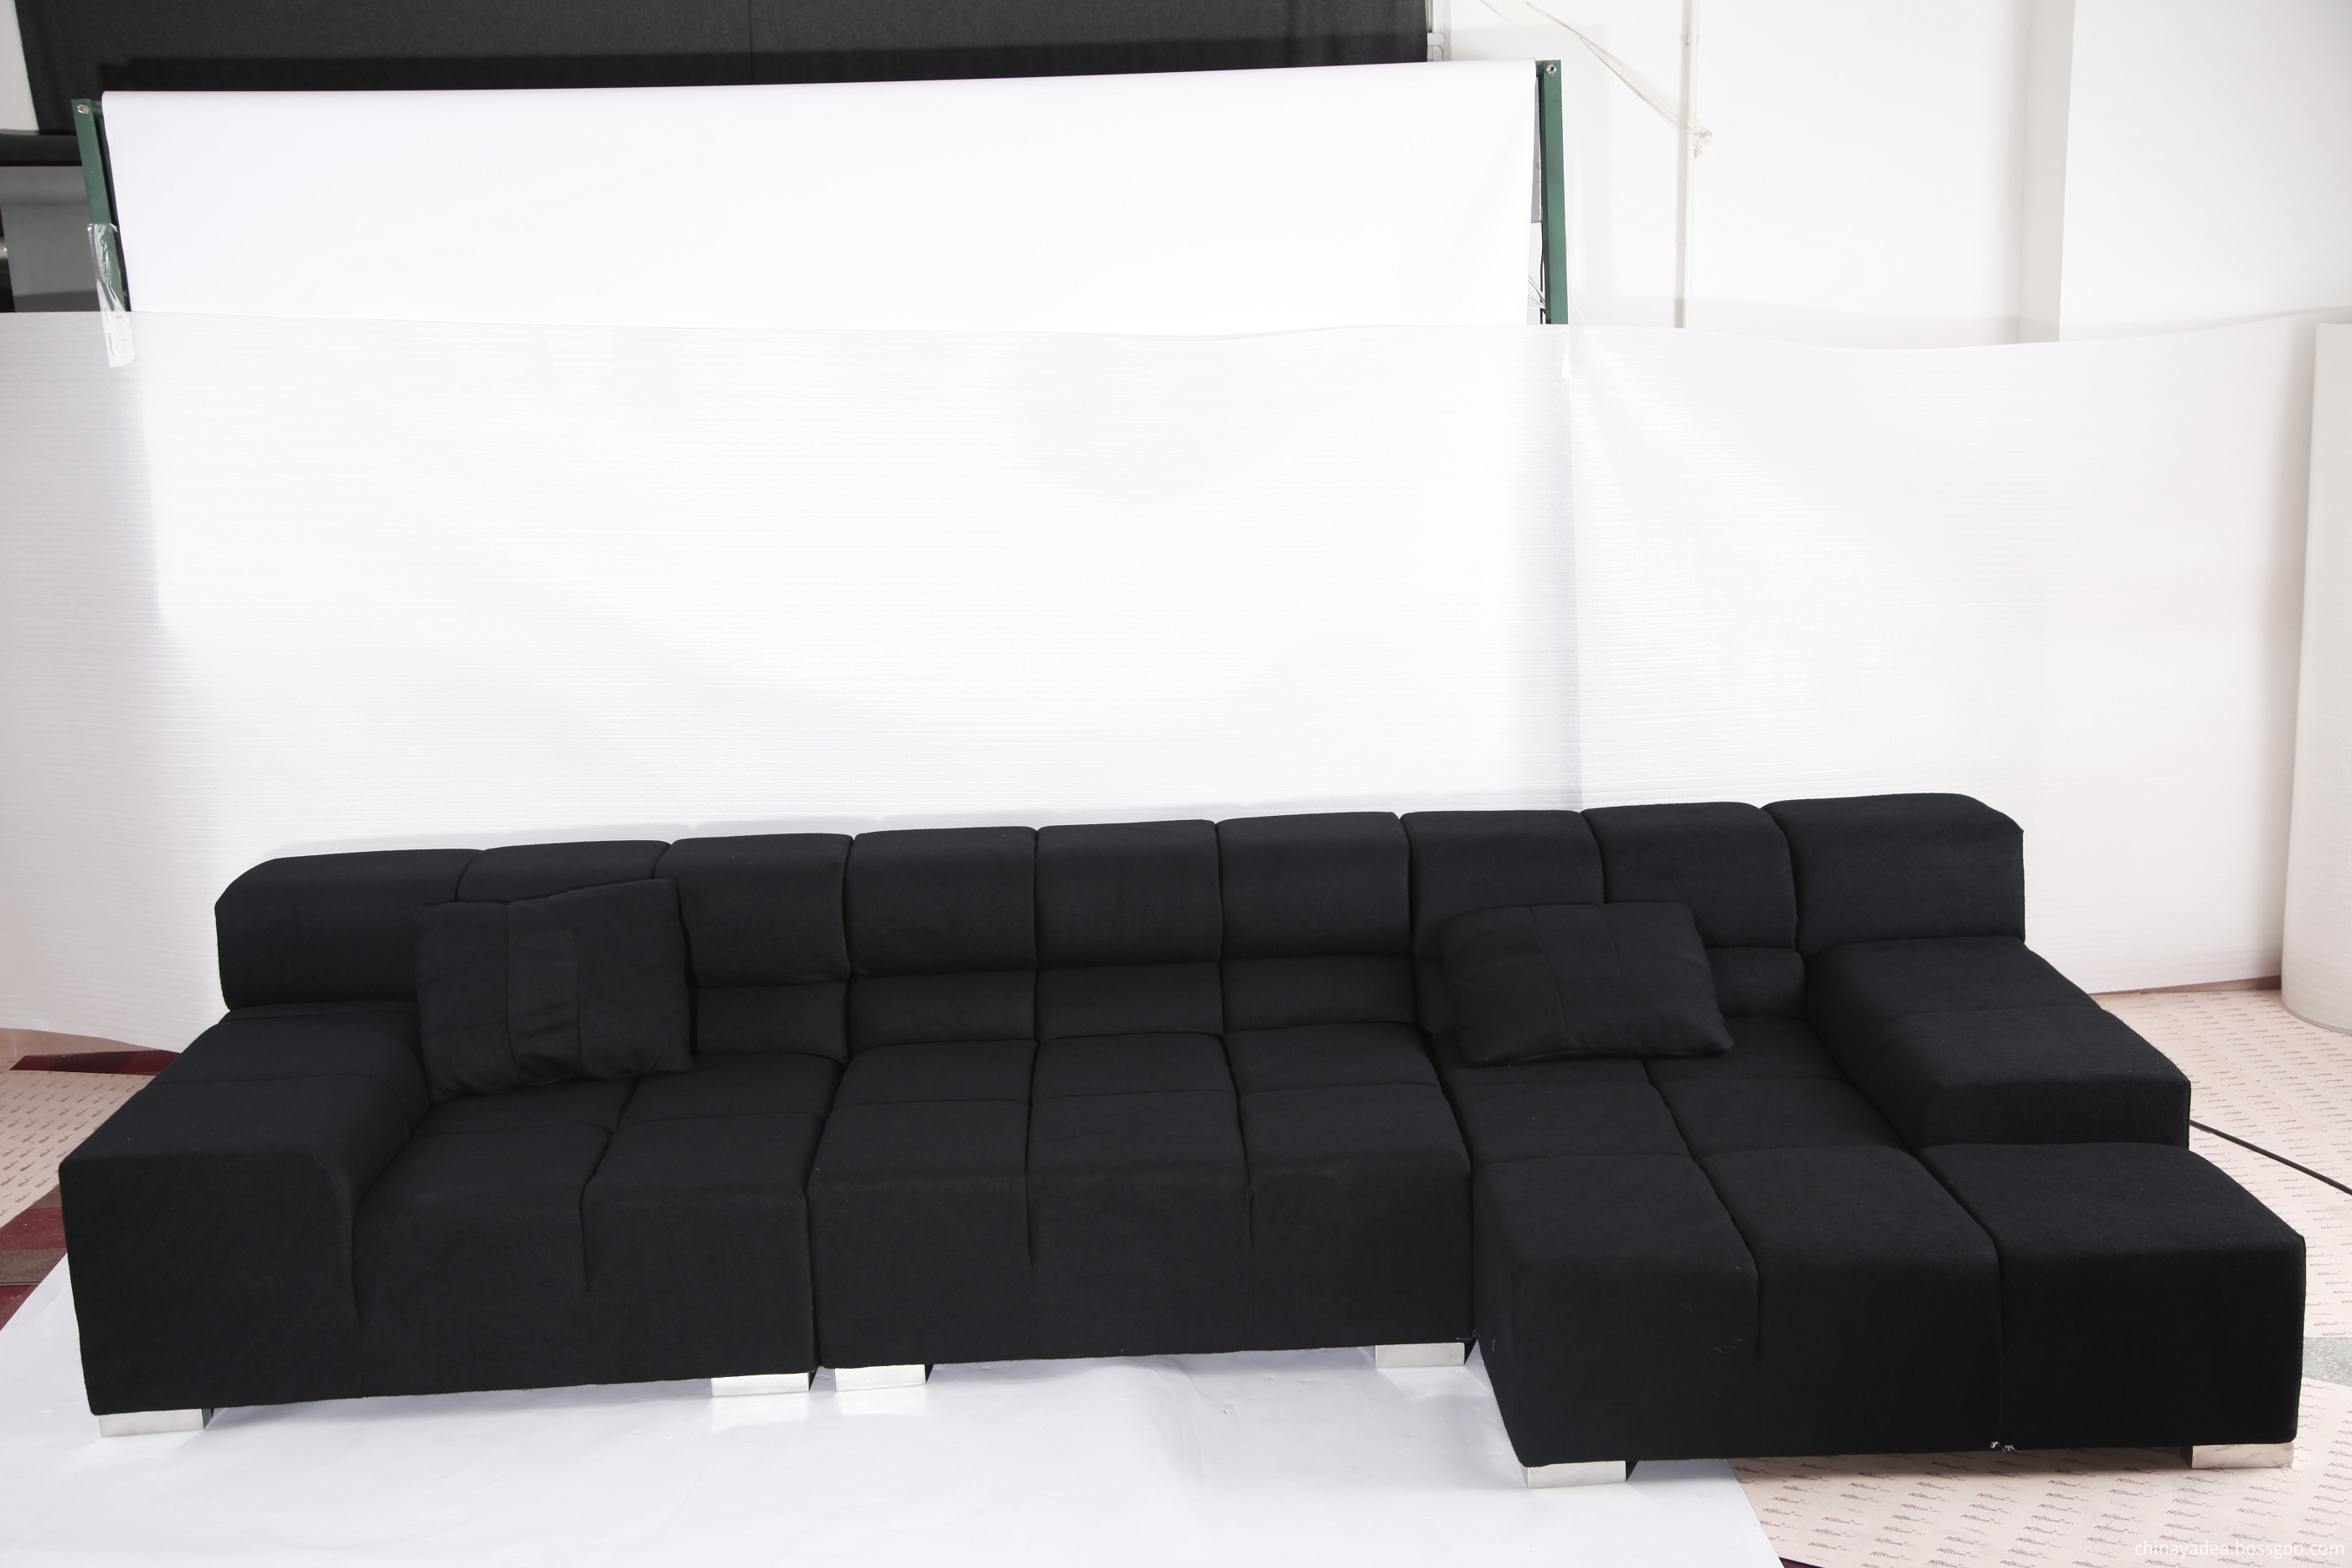 Tufty time sofa reproduction